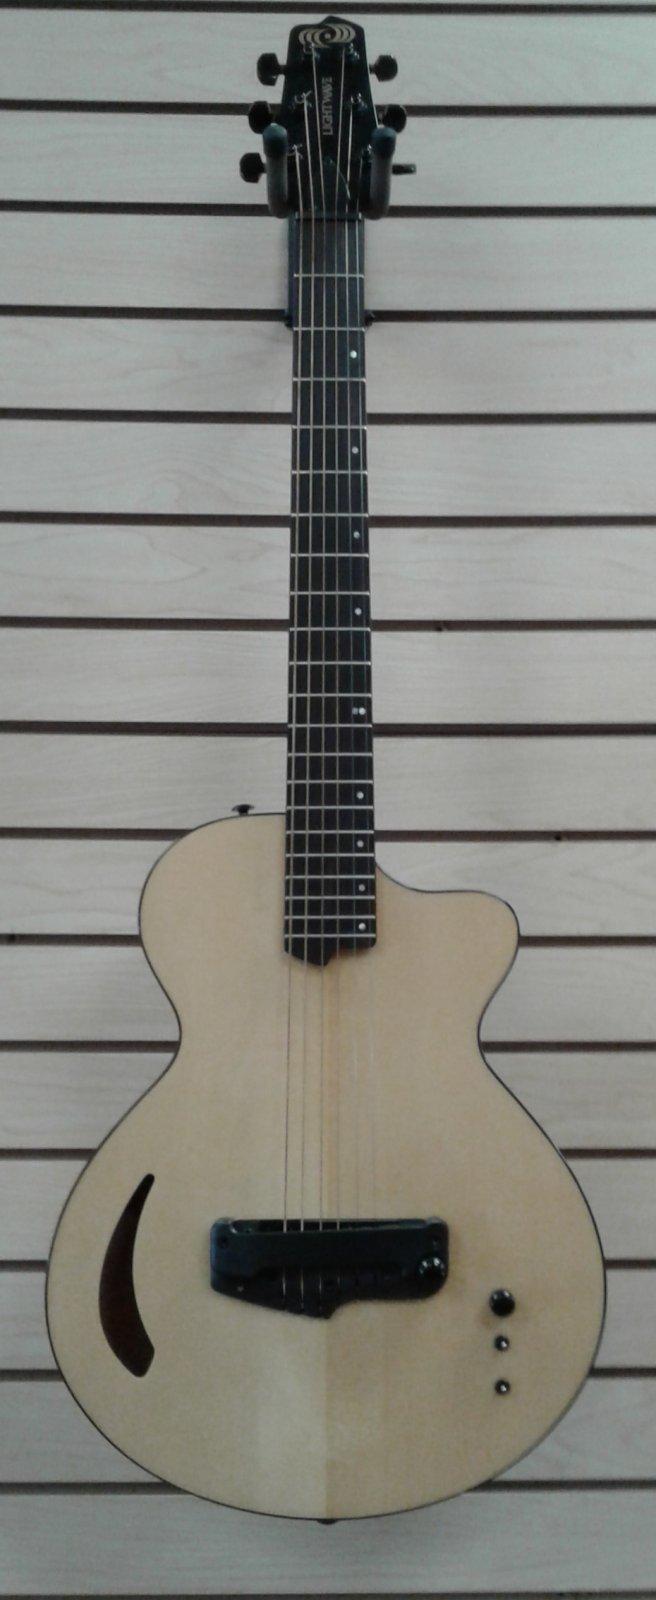 Preowned Willcox Atlantis HexFX Guitar